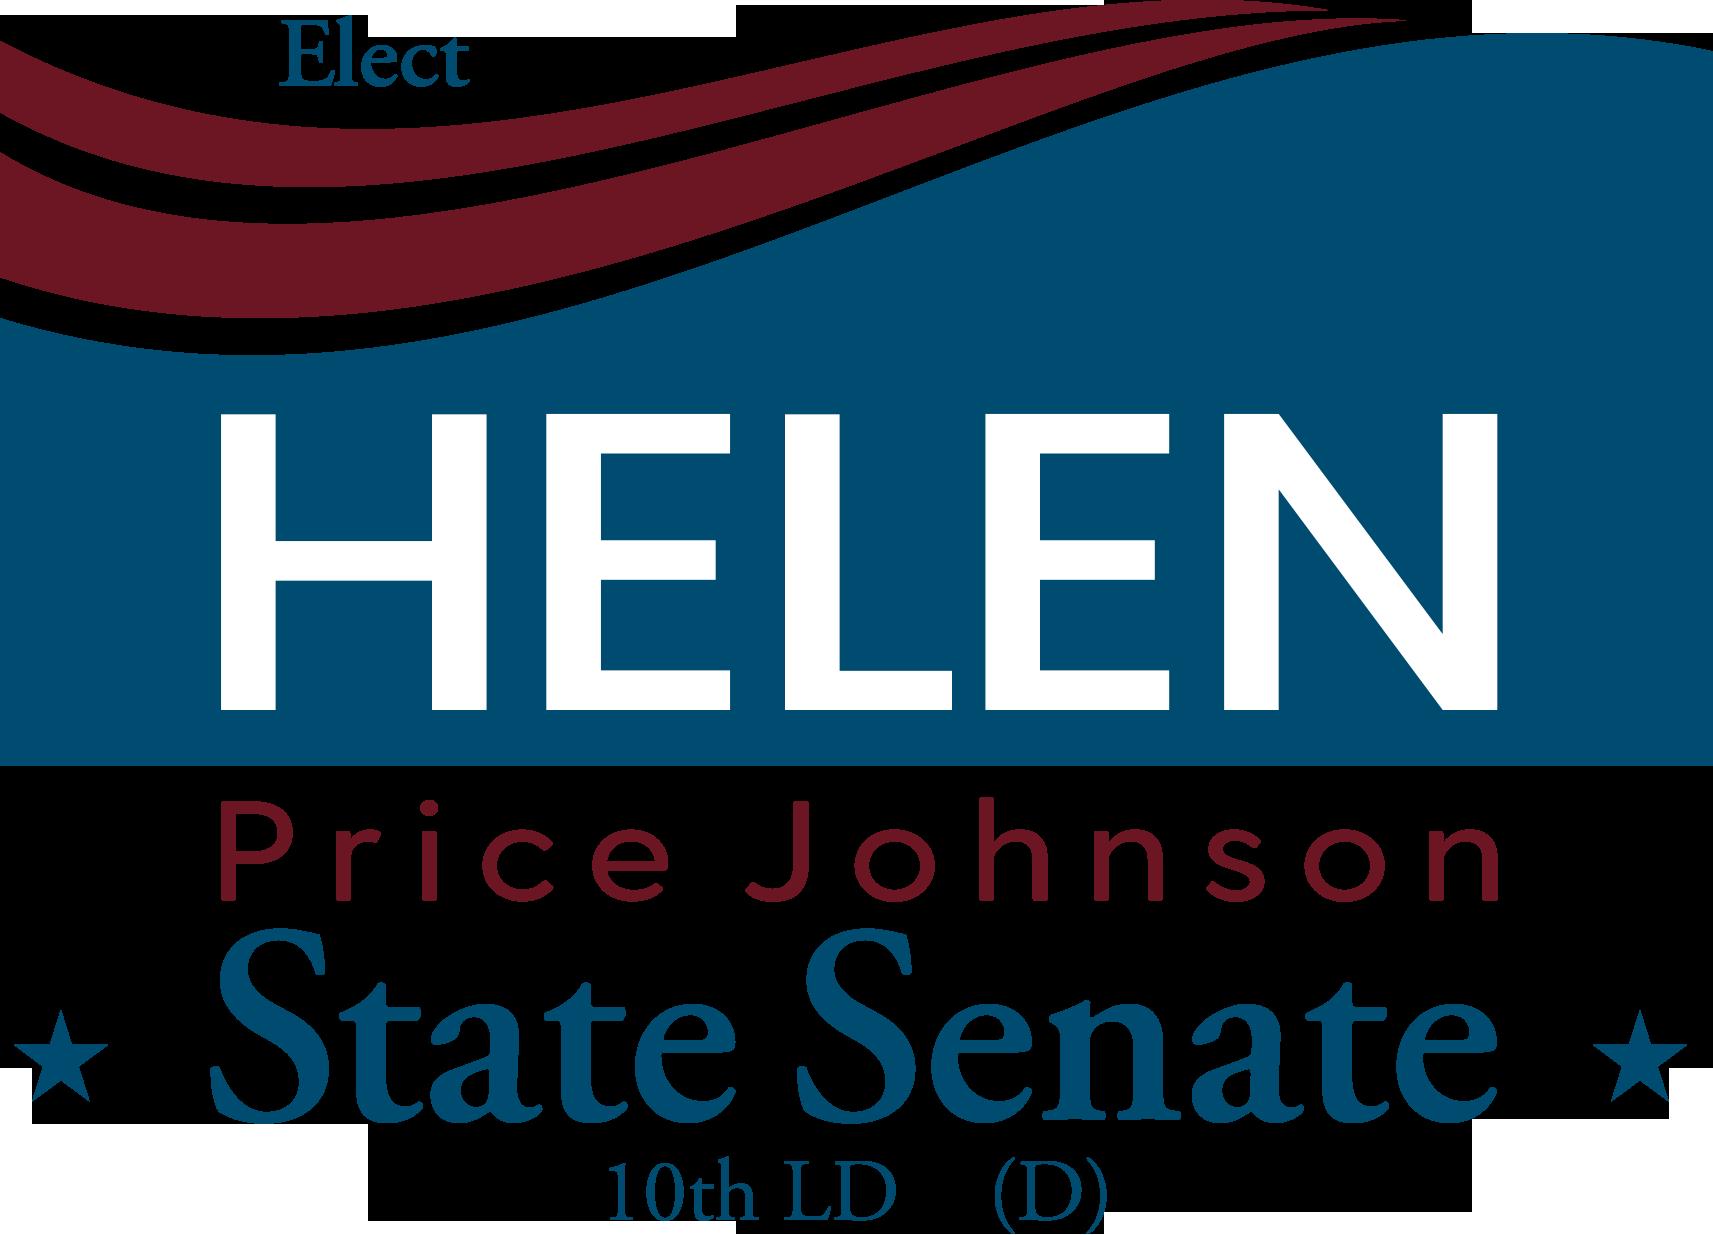 Helen Price Johnson